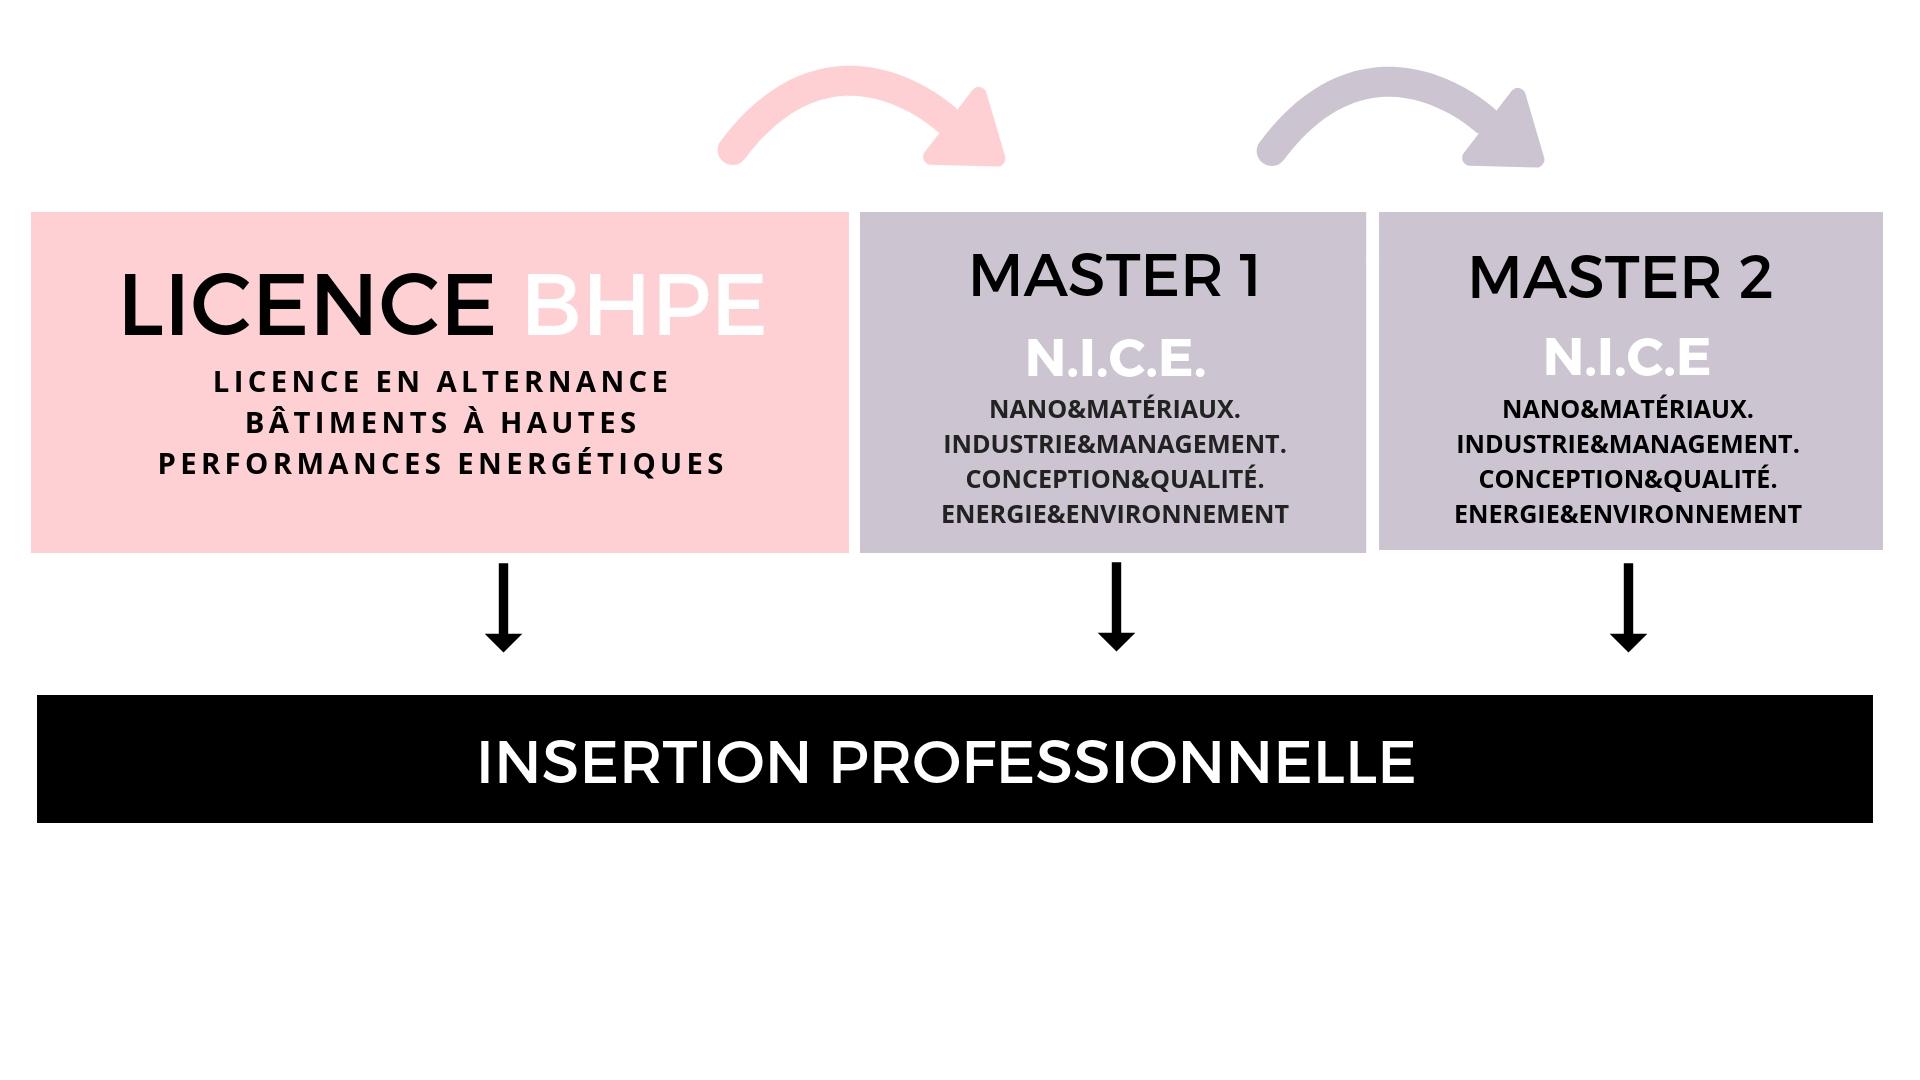 Site : www.unice.fr/master-pro-mqm